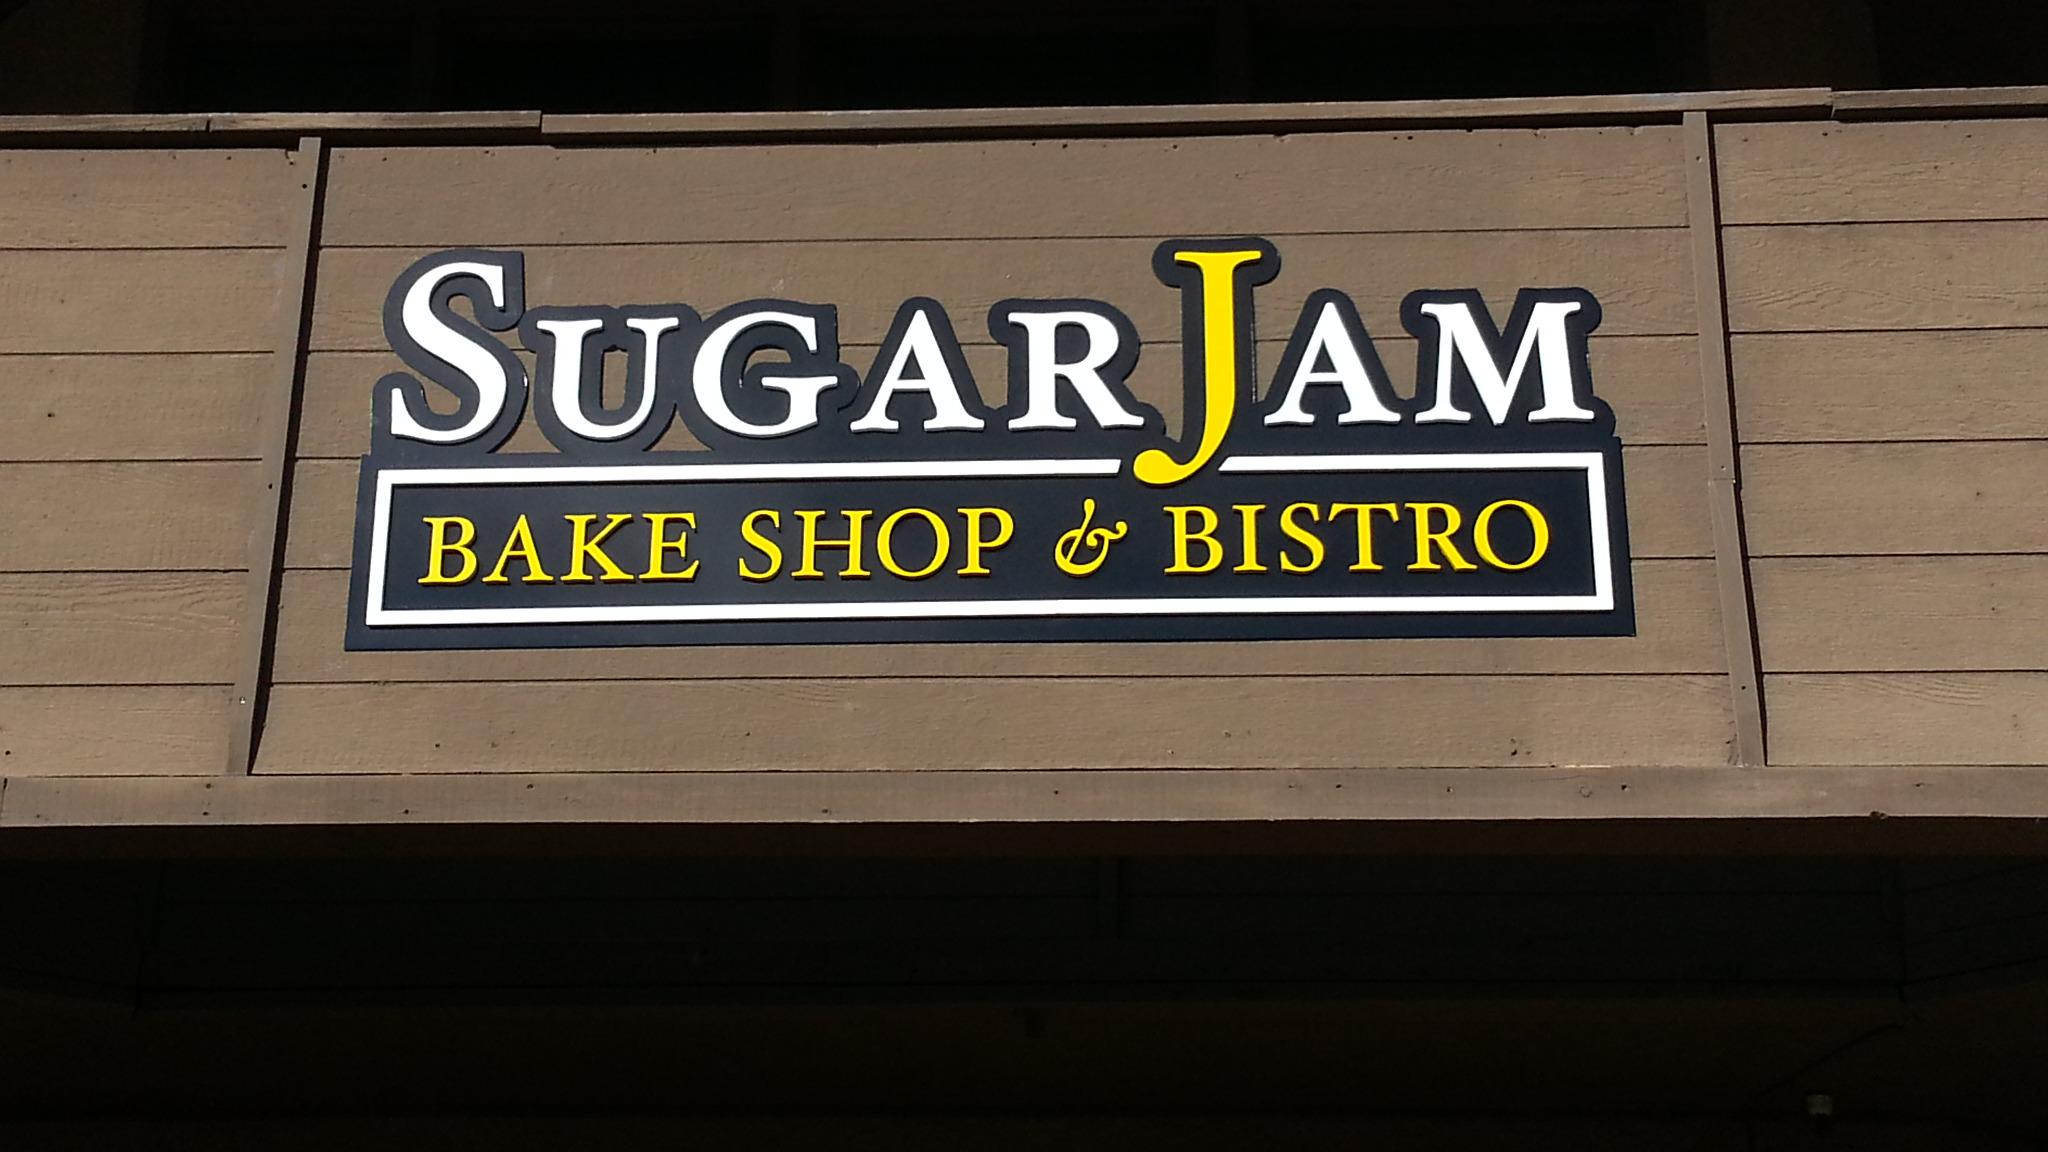 SugarJam The Southern Kitchen